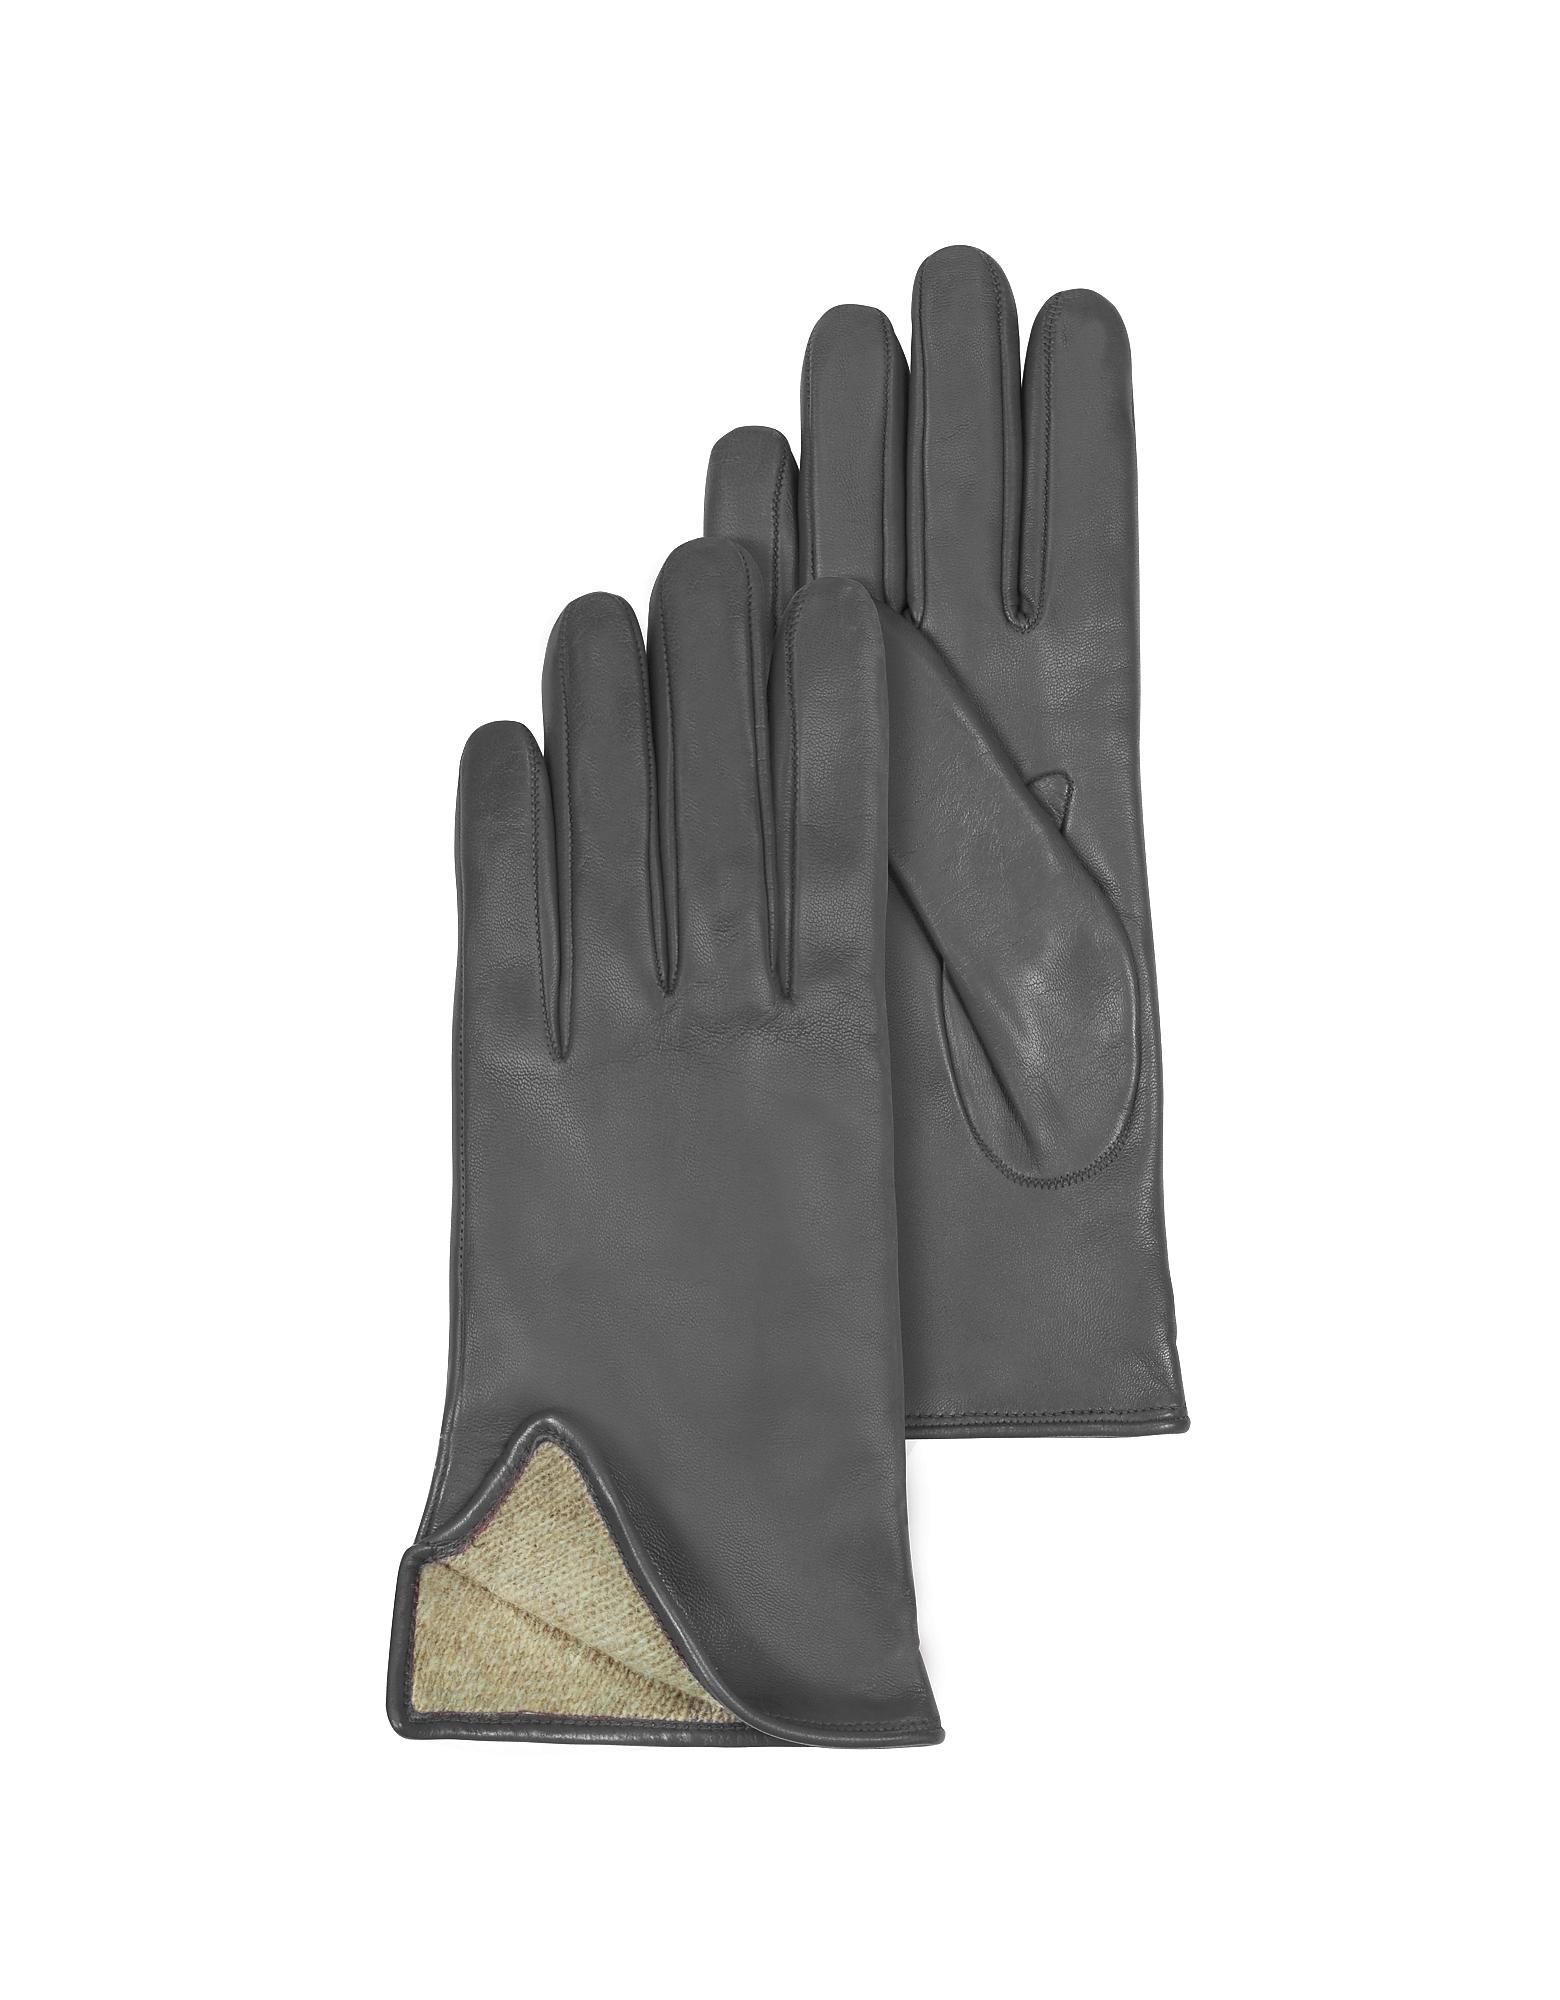 Dark Gray Leather Women's Gloves w/Cashmere Lining от Forzieri.com INT